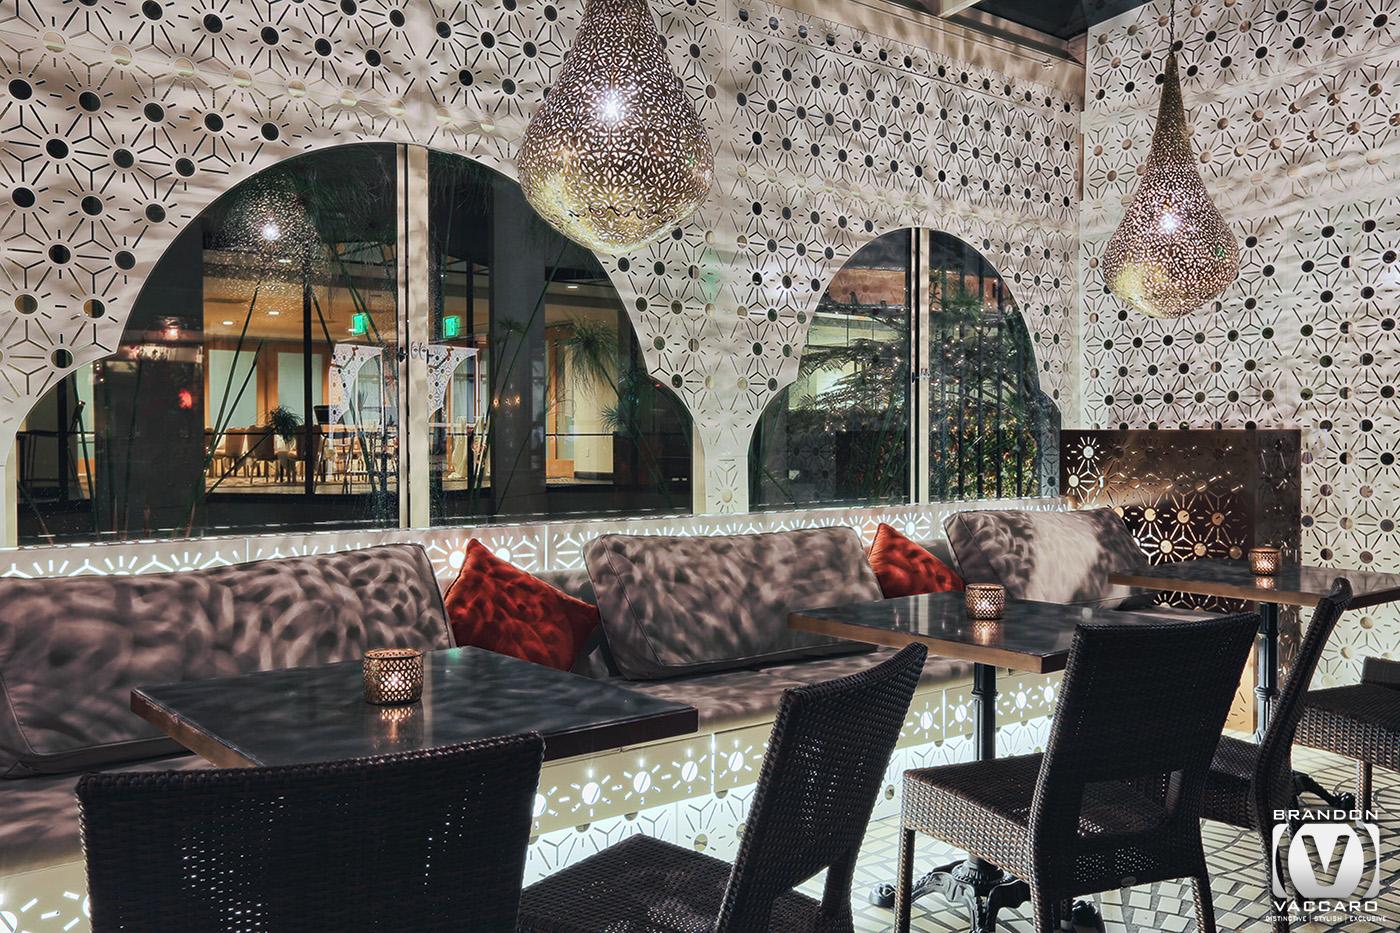 architecture-sens-restaurant-4-embarcadero-center-san-francisco lounge.jpg